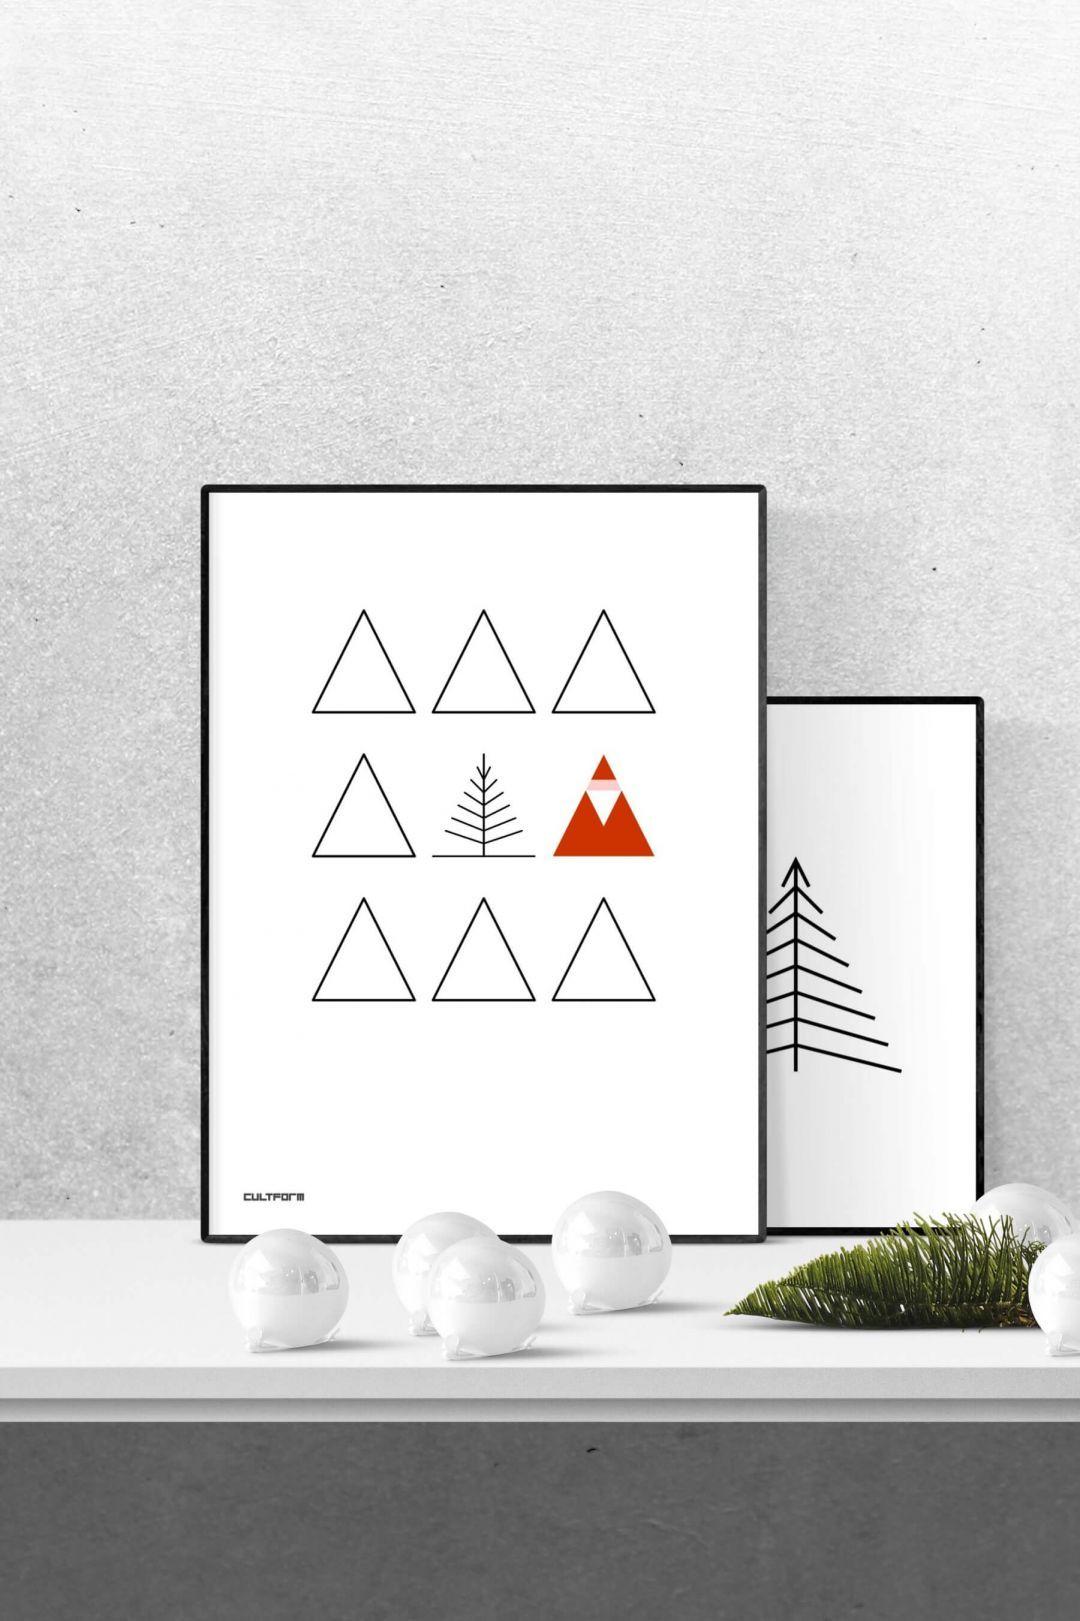 Dreiecke-wald-Santa-2zu3-klein